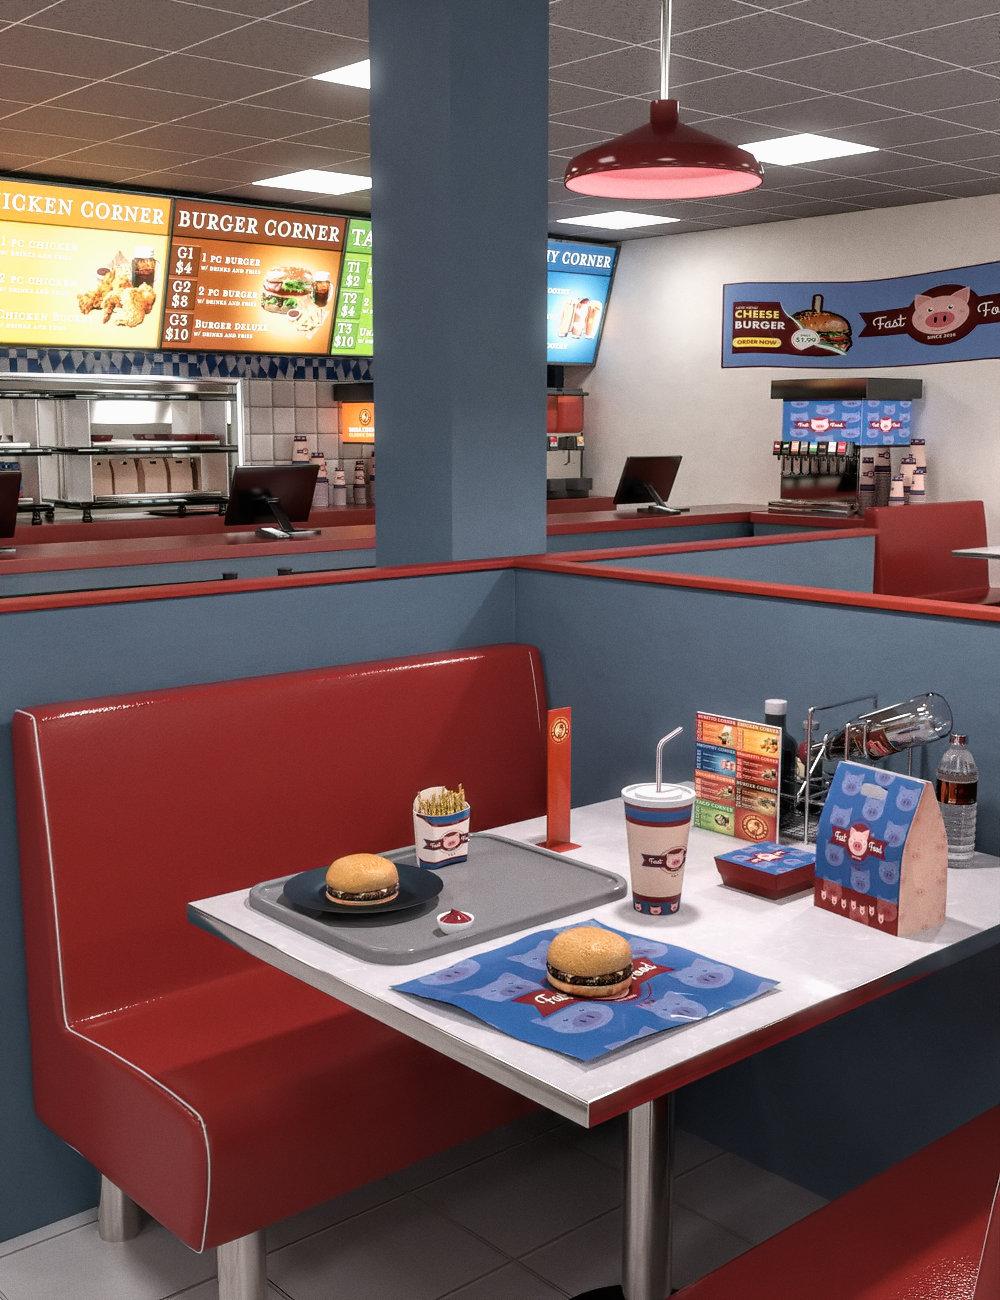 FG Fast Food by: Fugazi1968Ironman, 3D Models by Daz 3D